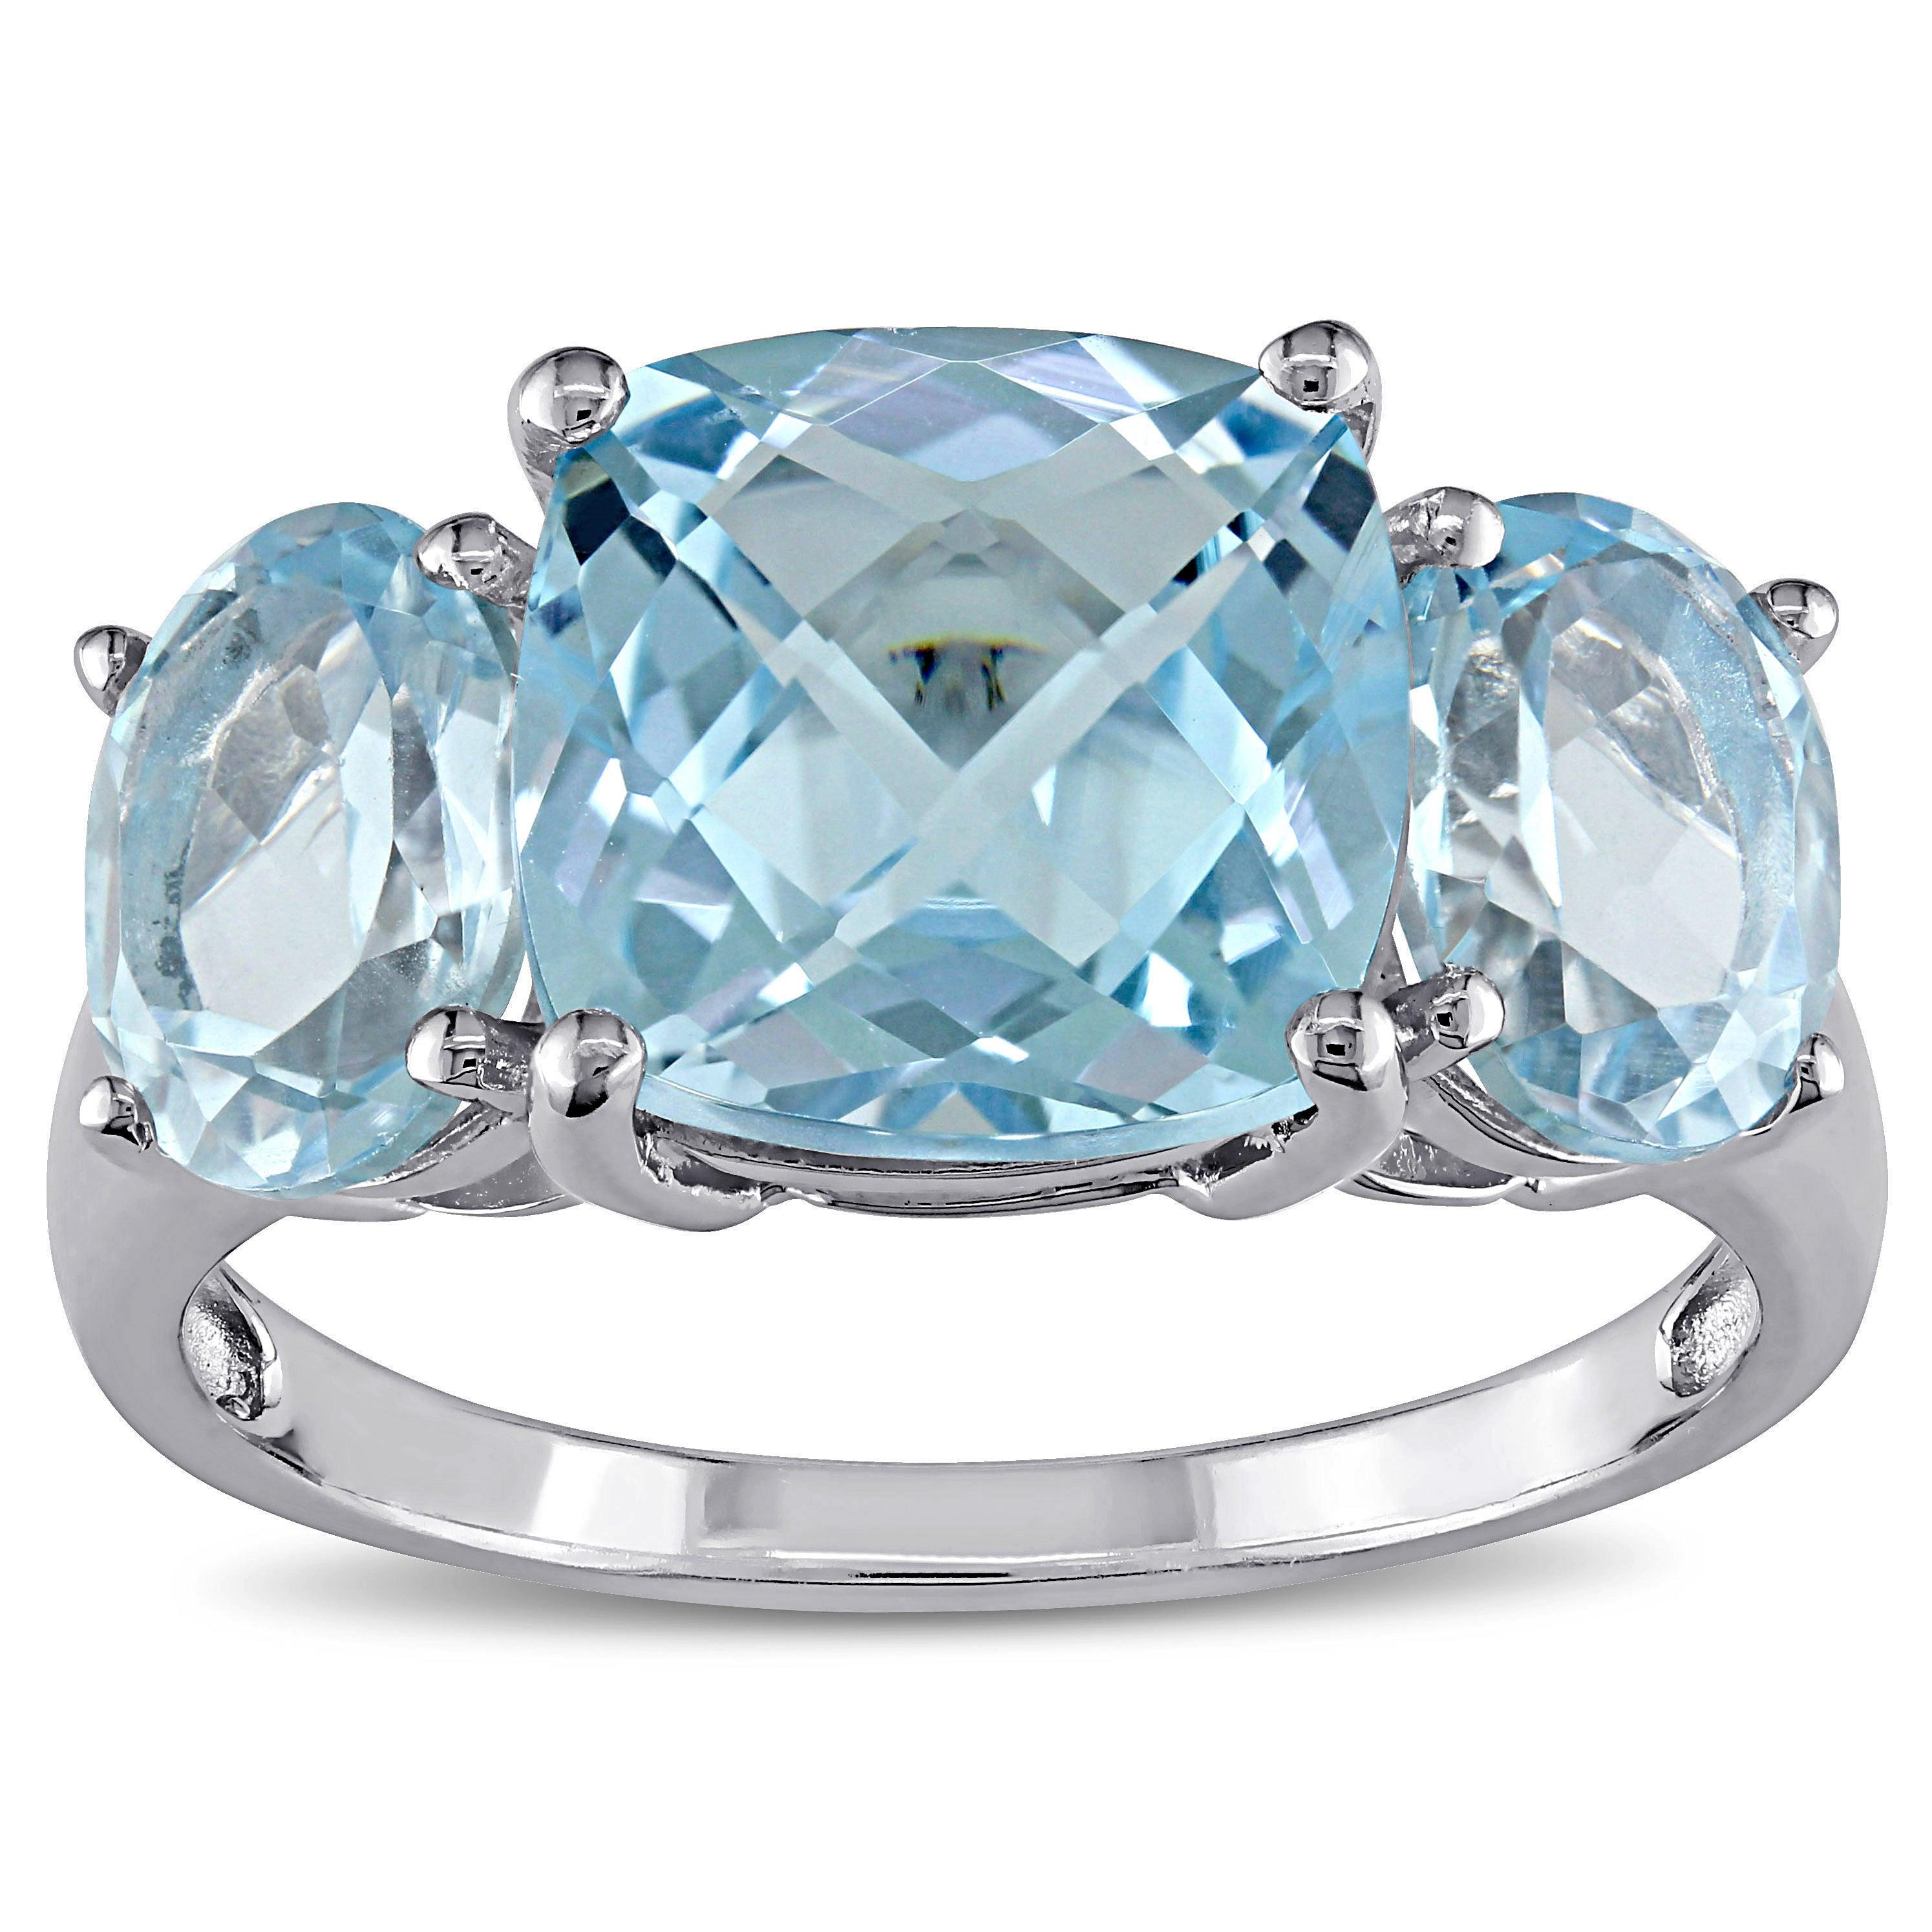 Shop Miadora Sterling Silver Sky Blue Topaz Ring - On Sale - Free ...